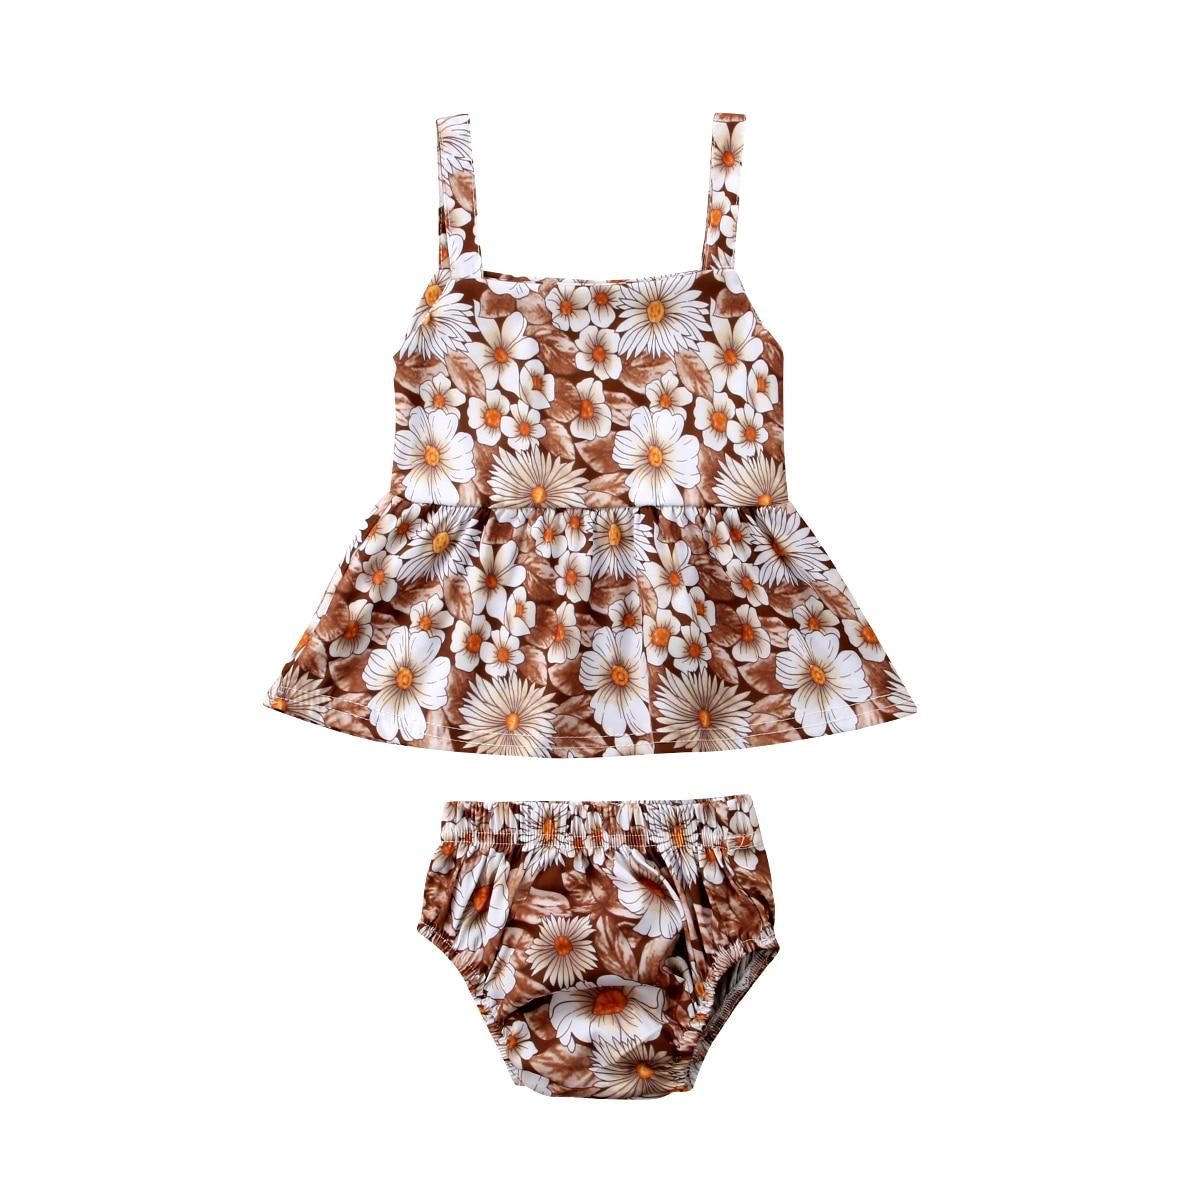 2PCS Newborn Baby Girls Flowers HOT SALE Sleeveless T-Shirt+Shorts Briefs Fashion Clothes Sets Summer 0-24M